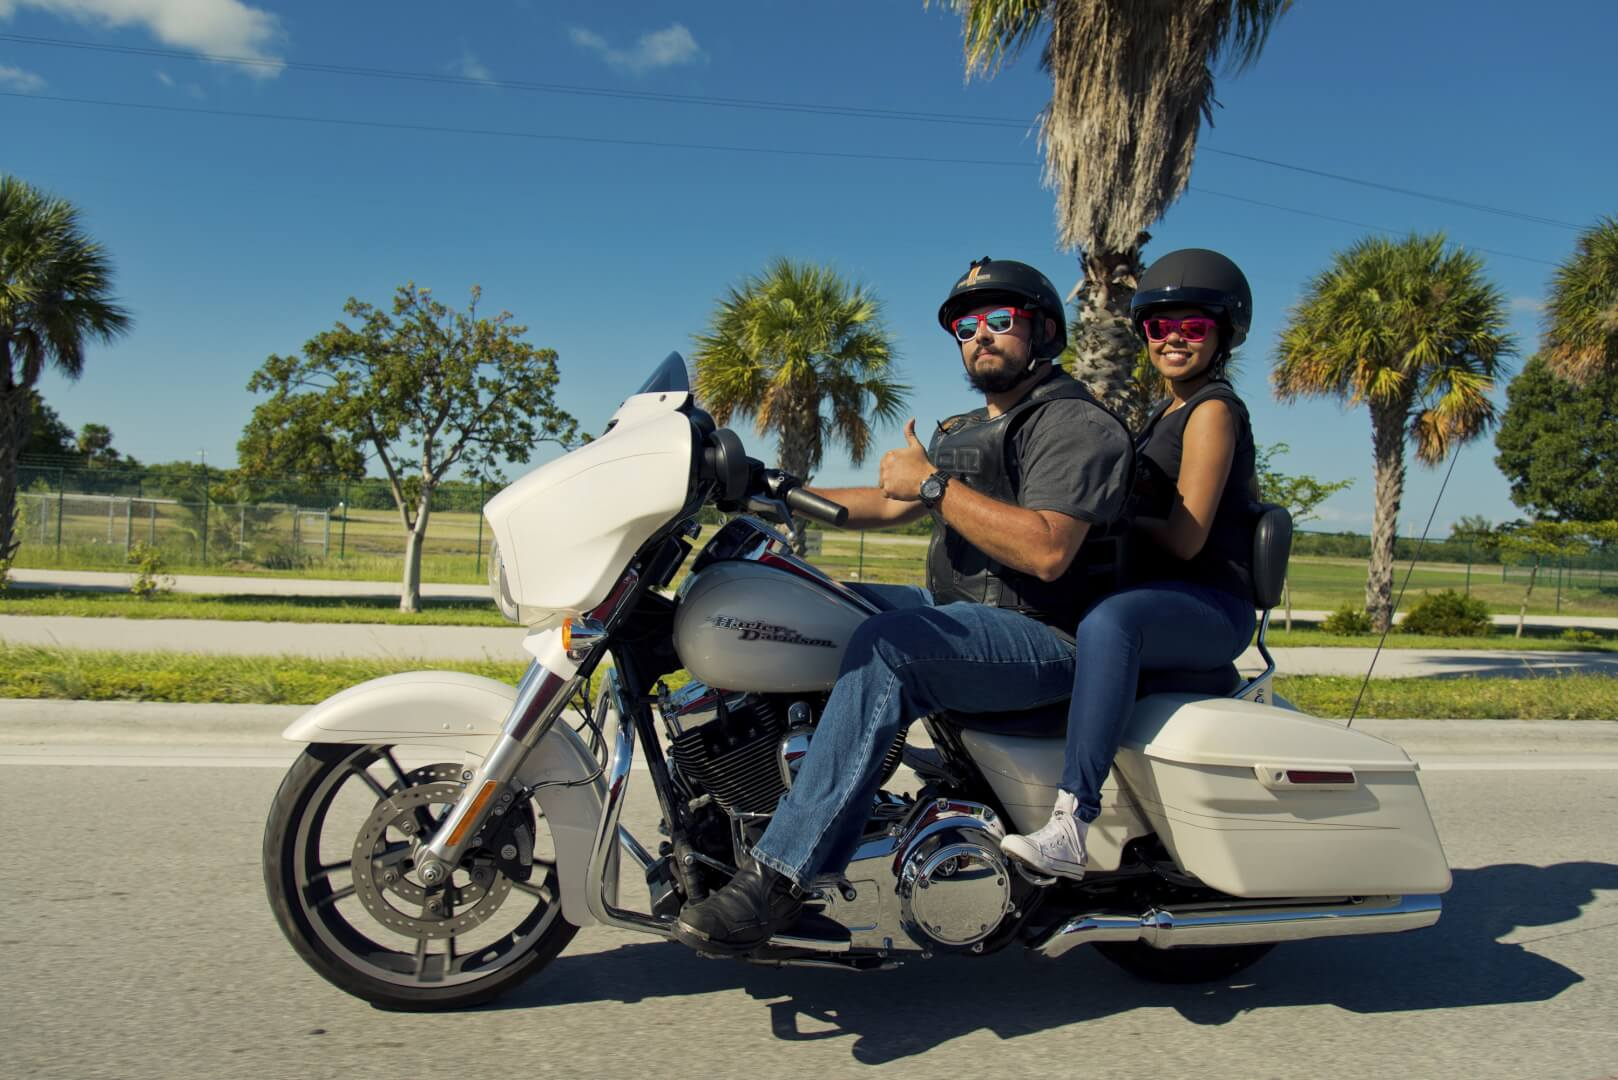 daytona bike week 2020 dates